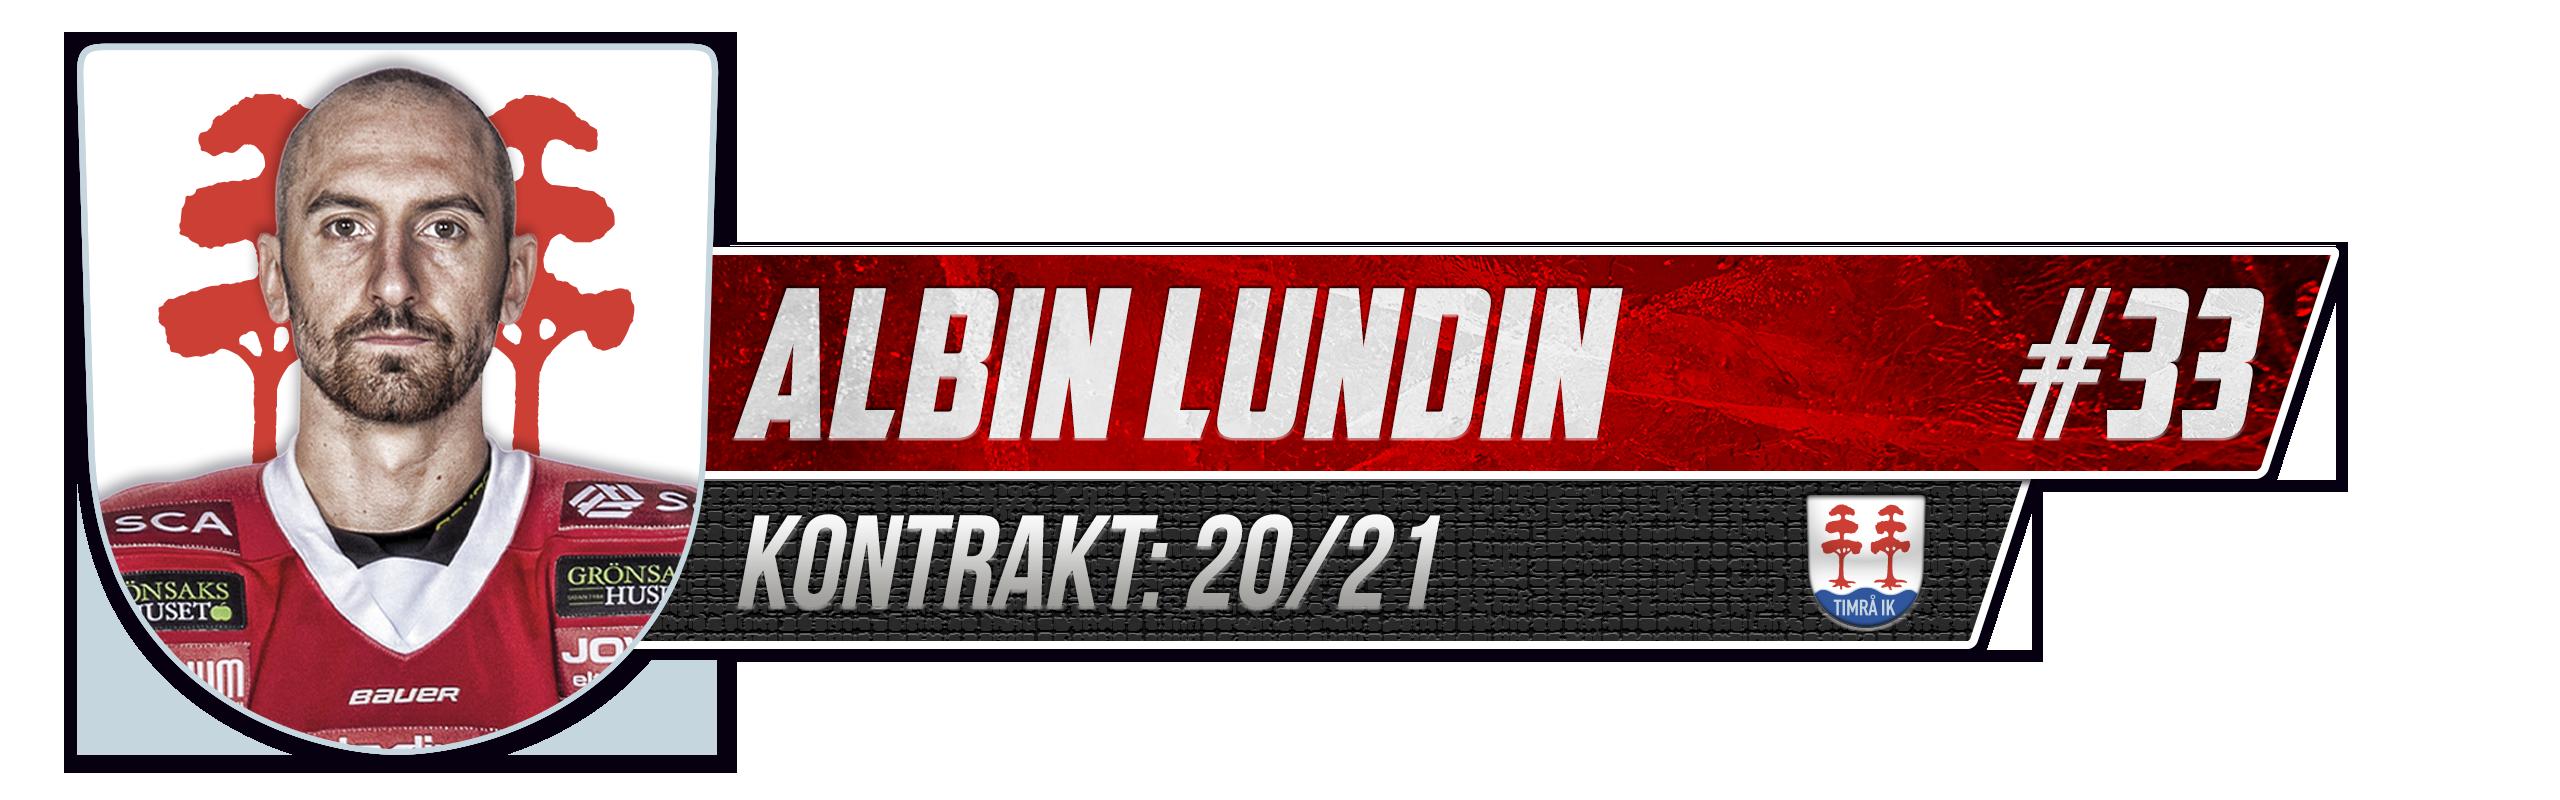 Albin Lundin